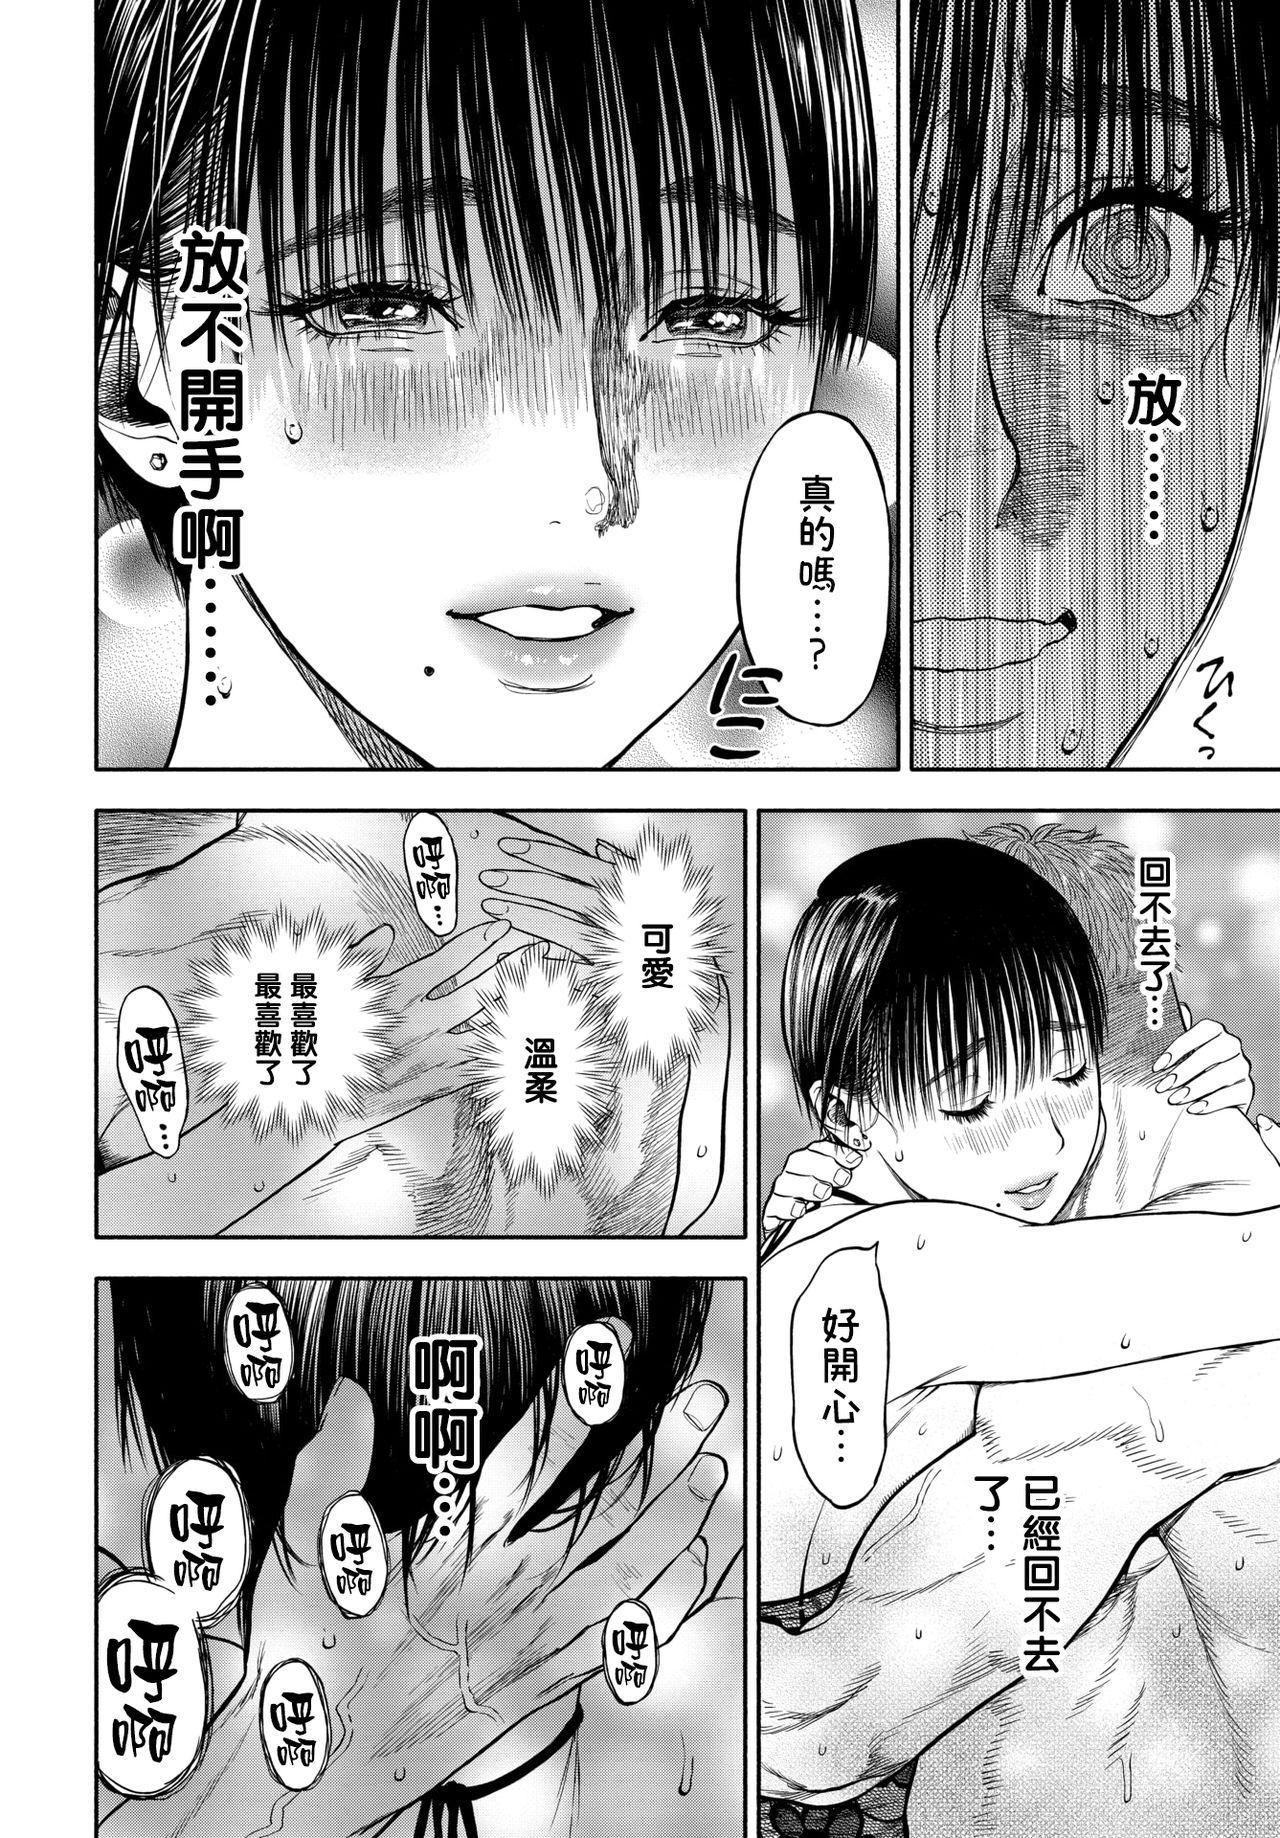 [usa] 45-fun de Kare o Todokete - Delivery Love (COMIC BAVEL 2020-12) [Chinese] [路过的骑士汉化组] [Digital] 51